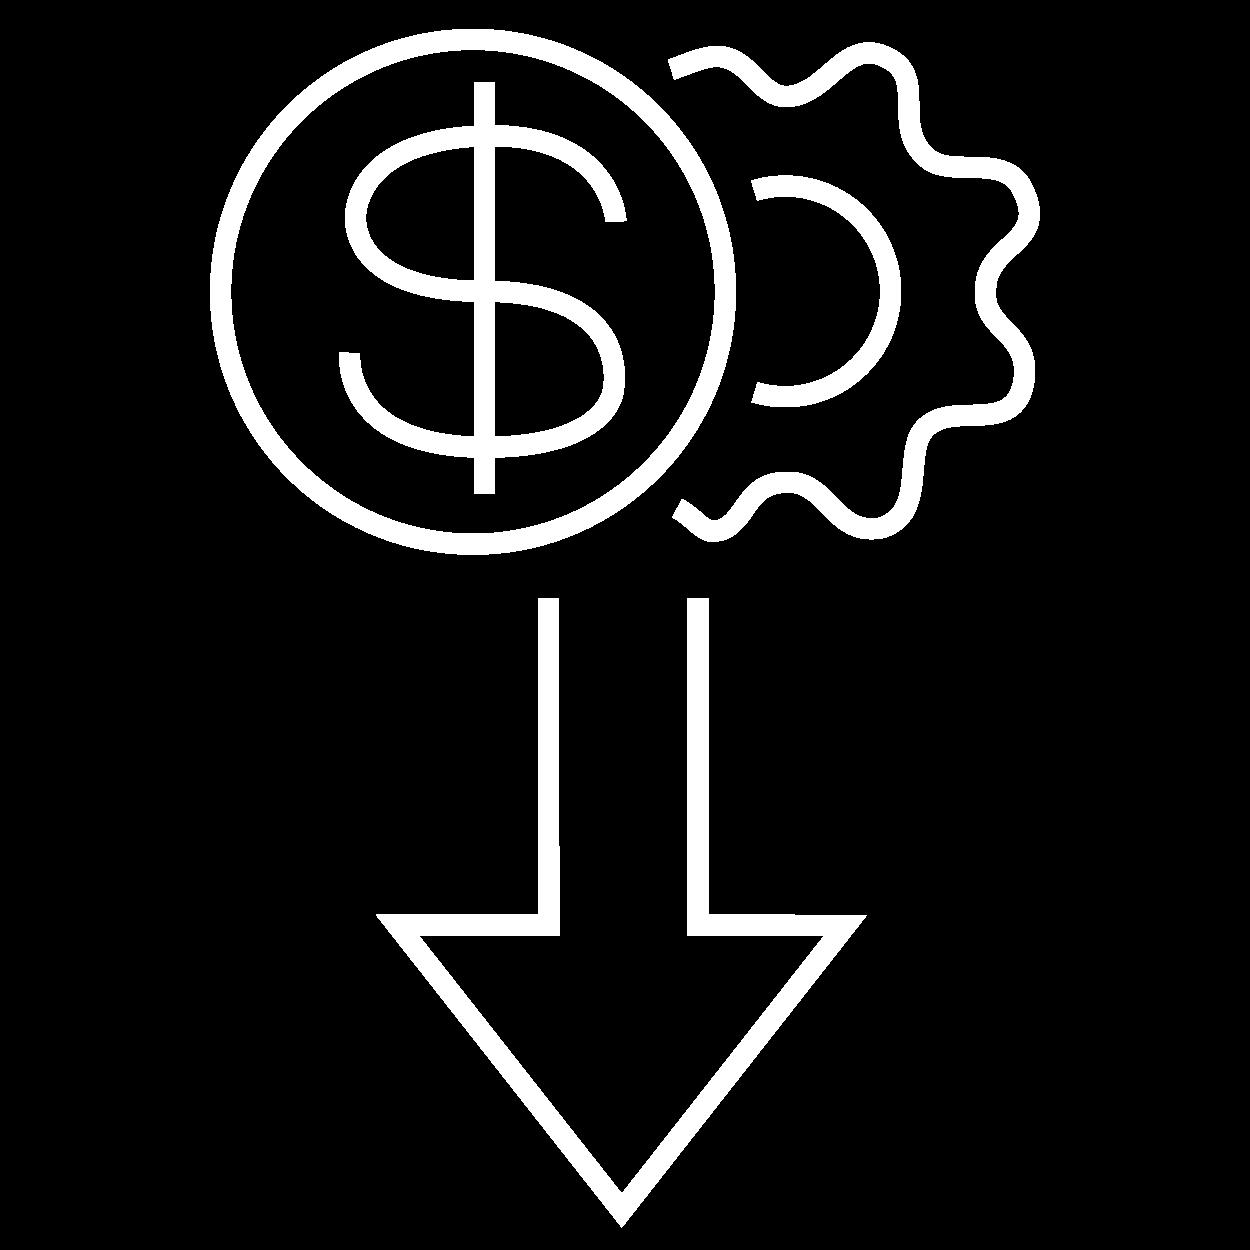 icone custo operacional